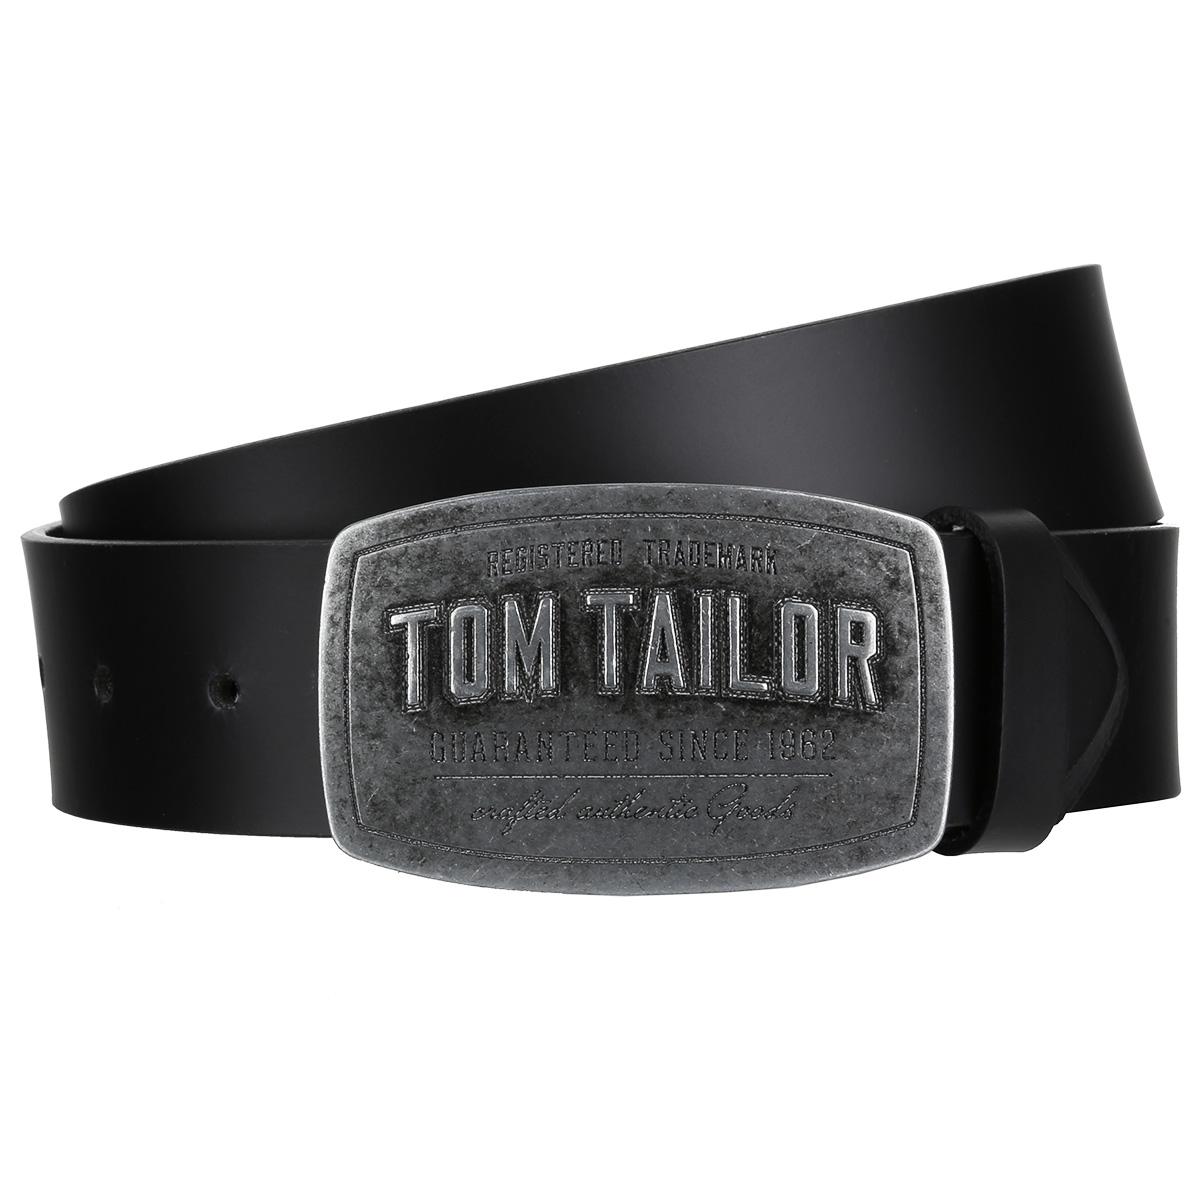 Tom Tailor Männer Leder Koppel Gürtel Belt Schwarz TG1060R01 0791 | online Shop Taschen, Koffer, Gelbörsen, Gürtel, Schirme, Tücher